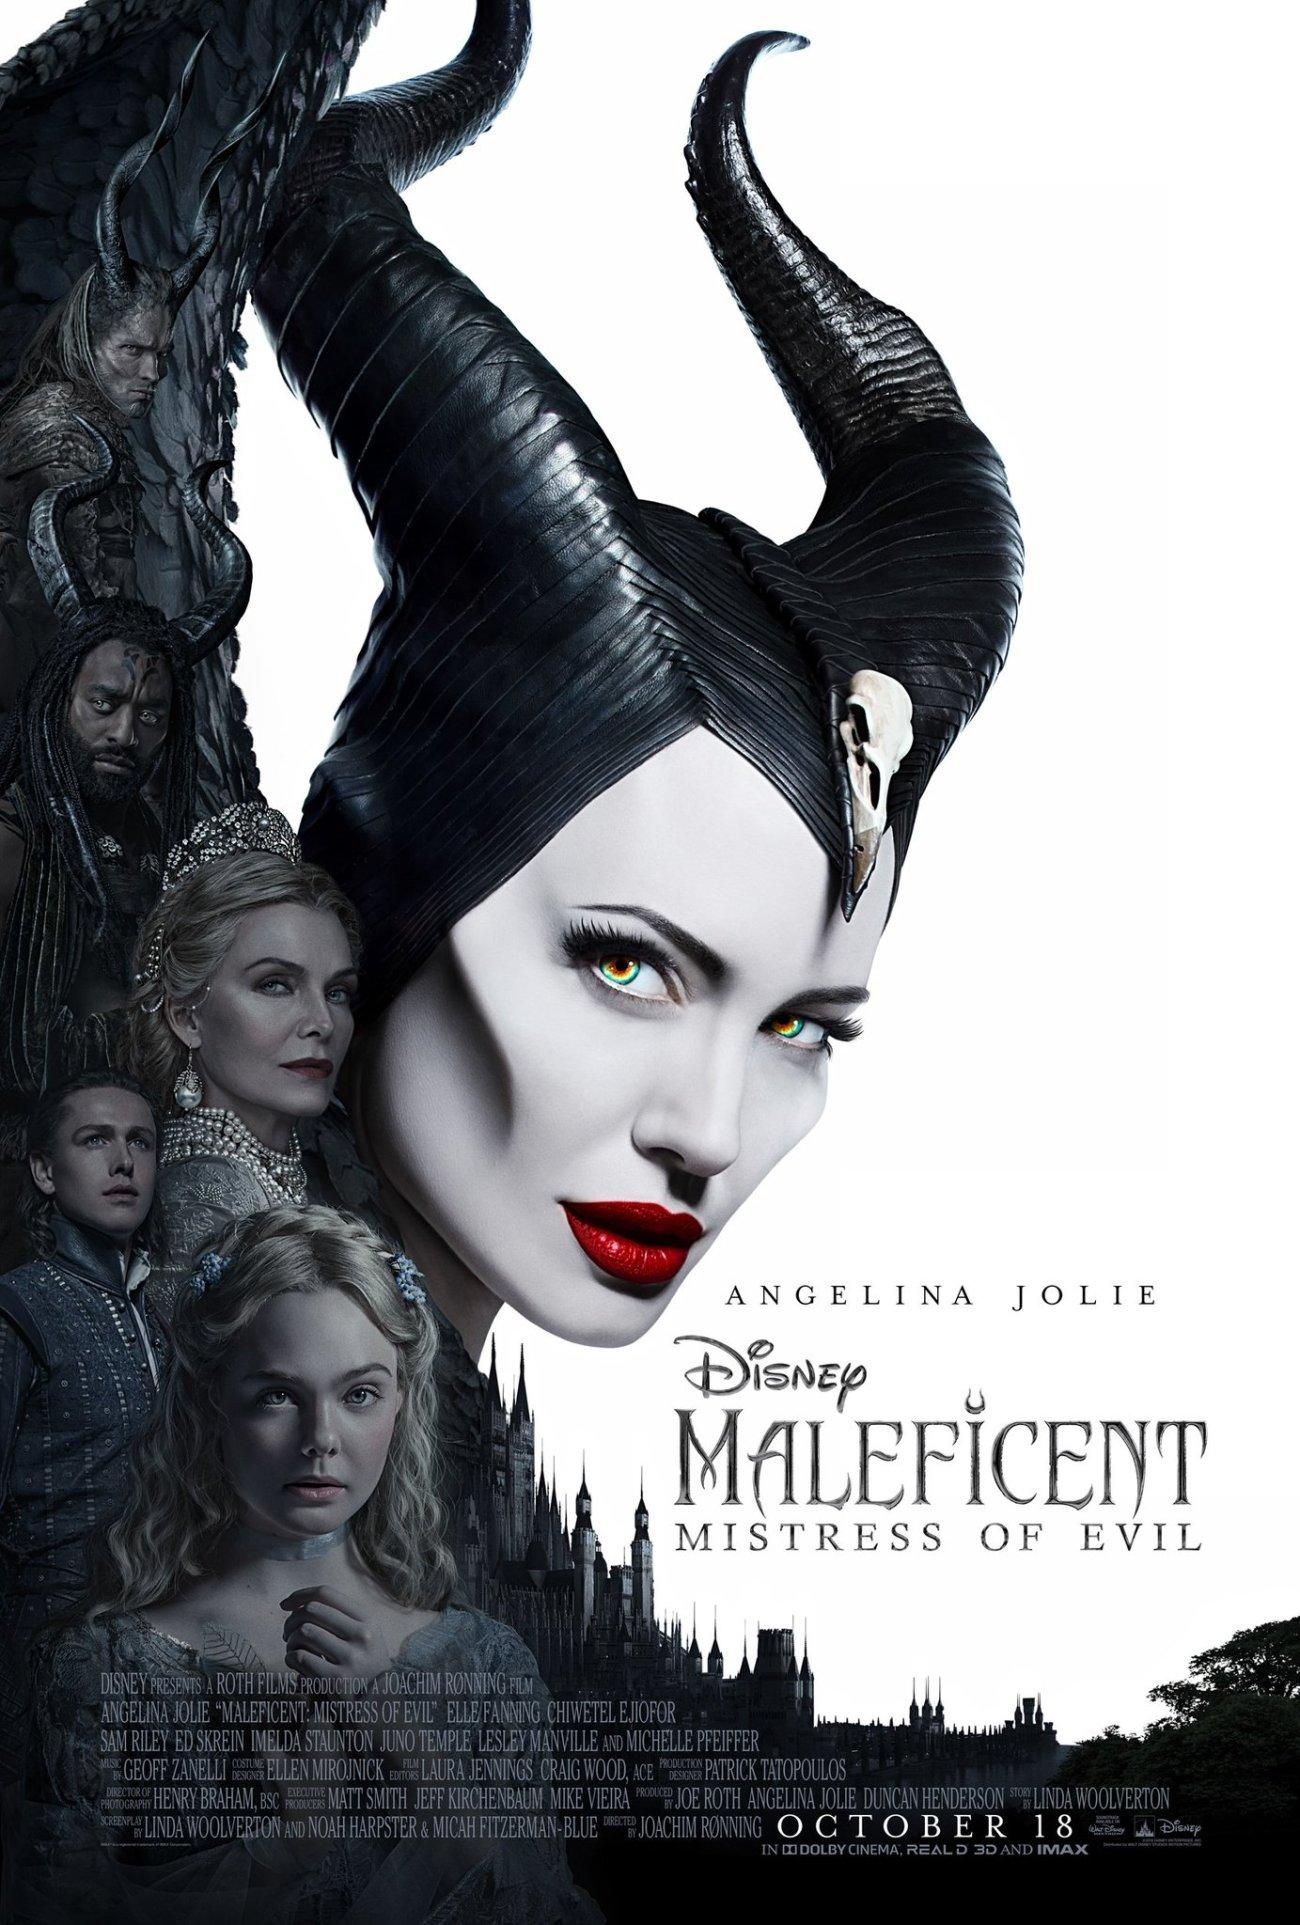 Póster de Maleficent: Mistress of Evil (2019). Imagen: Maleficent: Mistress of Evil Twitter (@Maleficent).